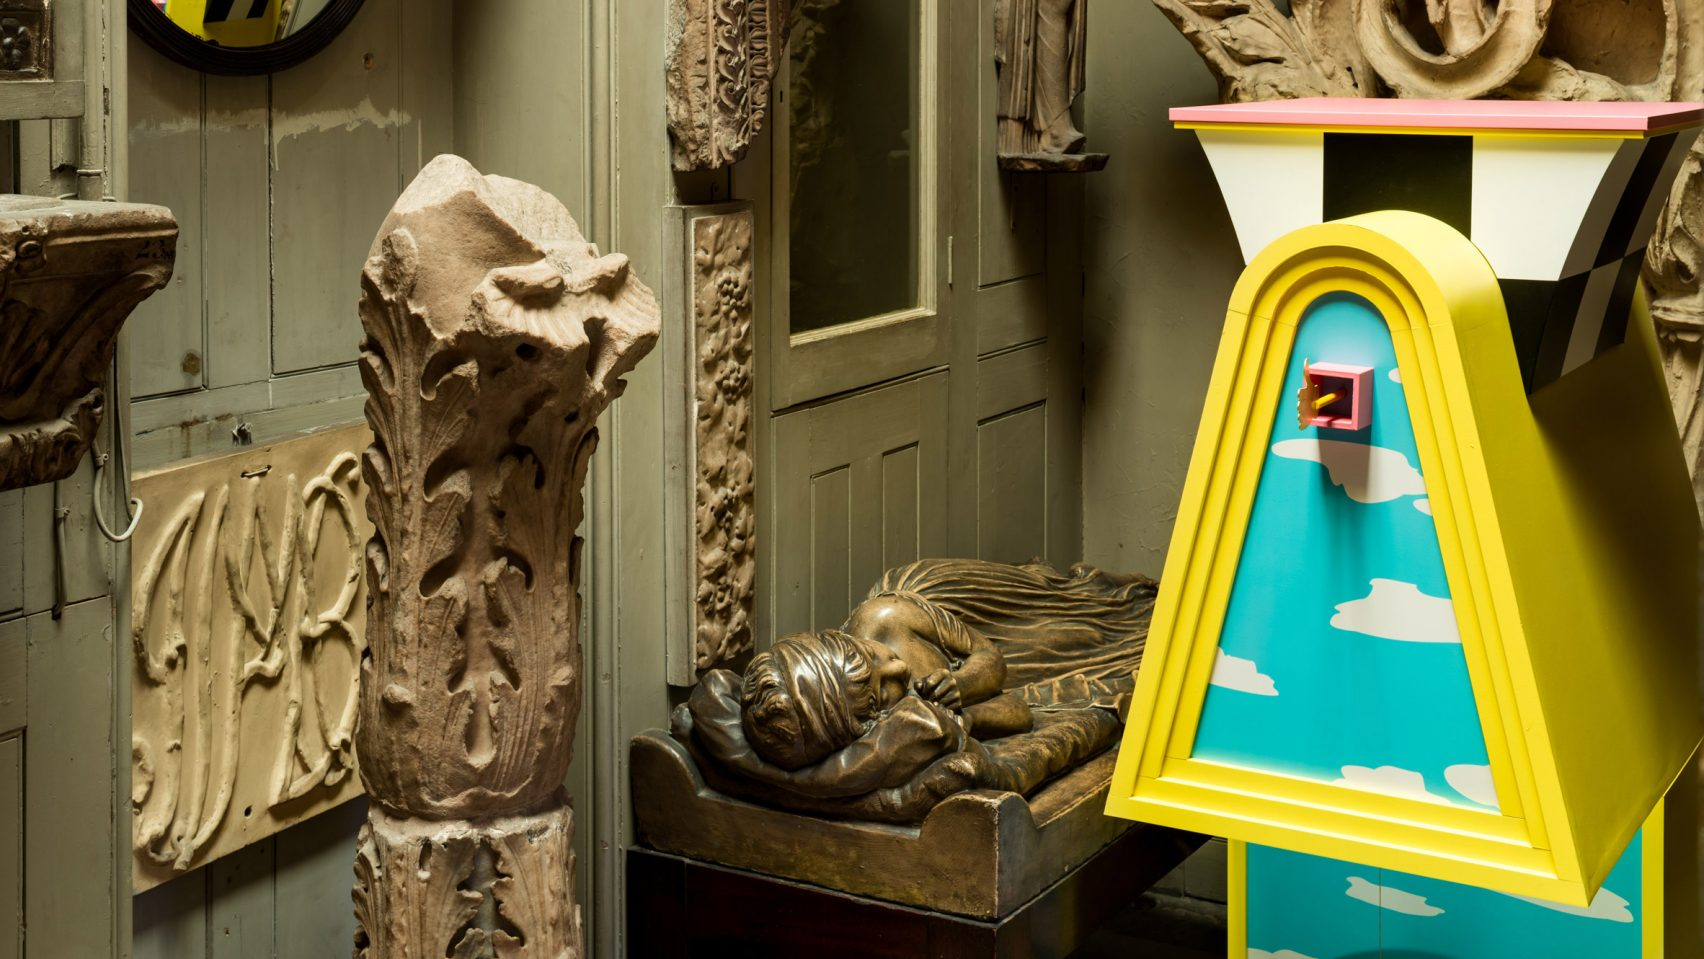 john-soane-architectural-characters-installation-london-uk_dezeen_hero-1704x959.jpg